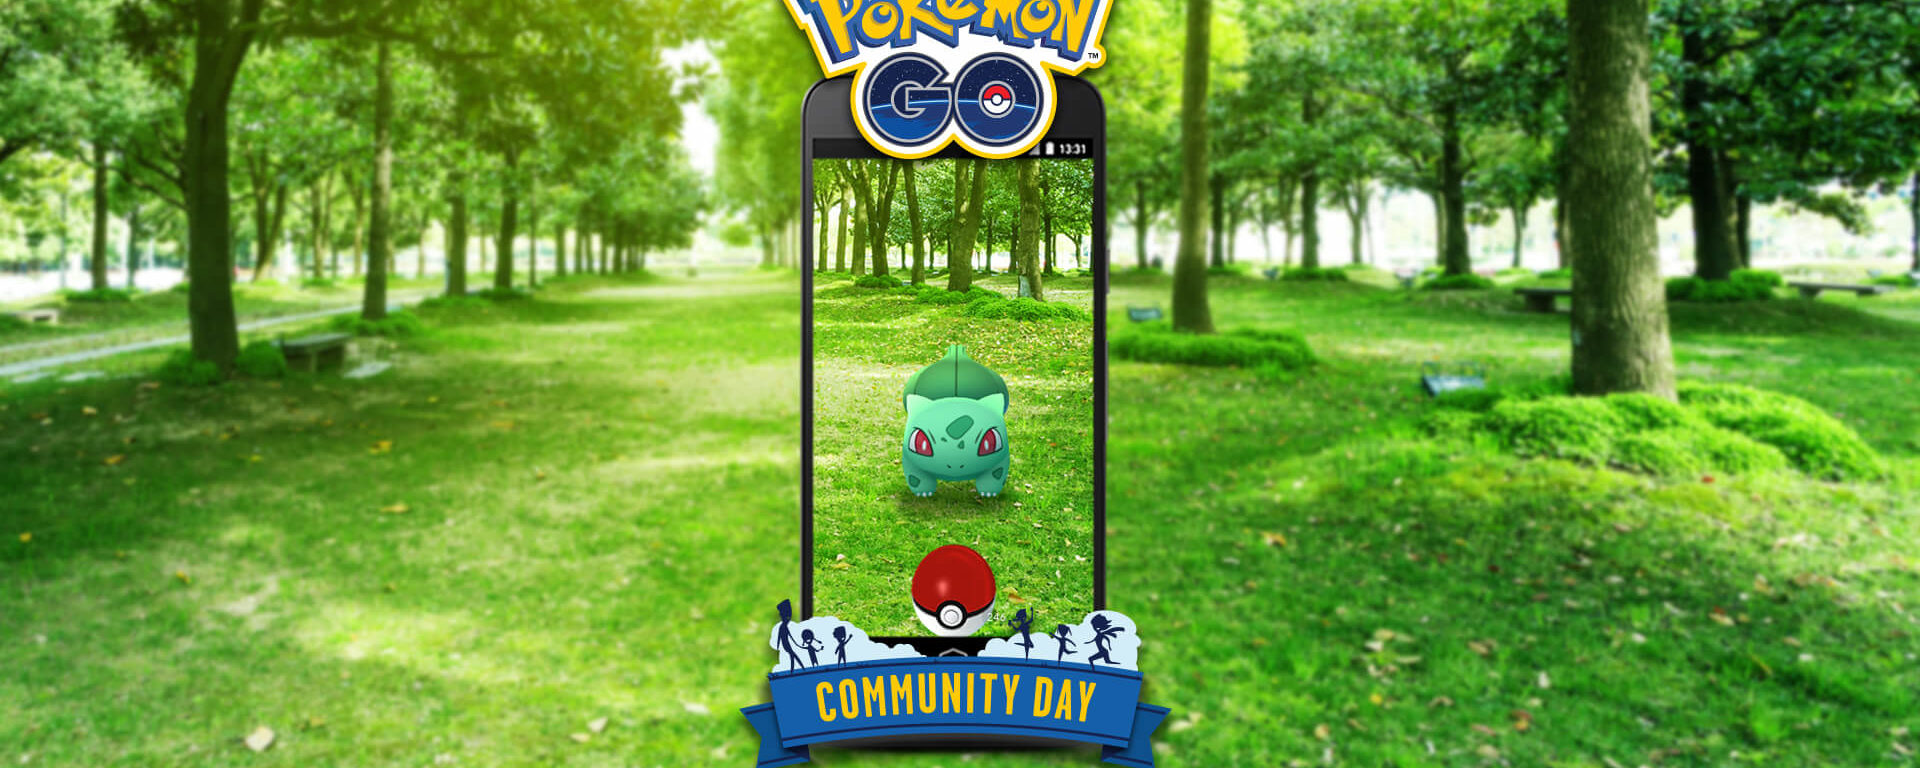 community-day-3-bulbizarre-pokemon-go